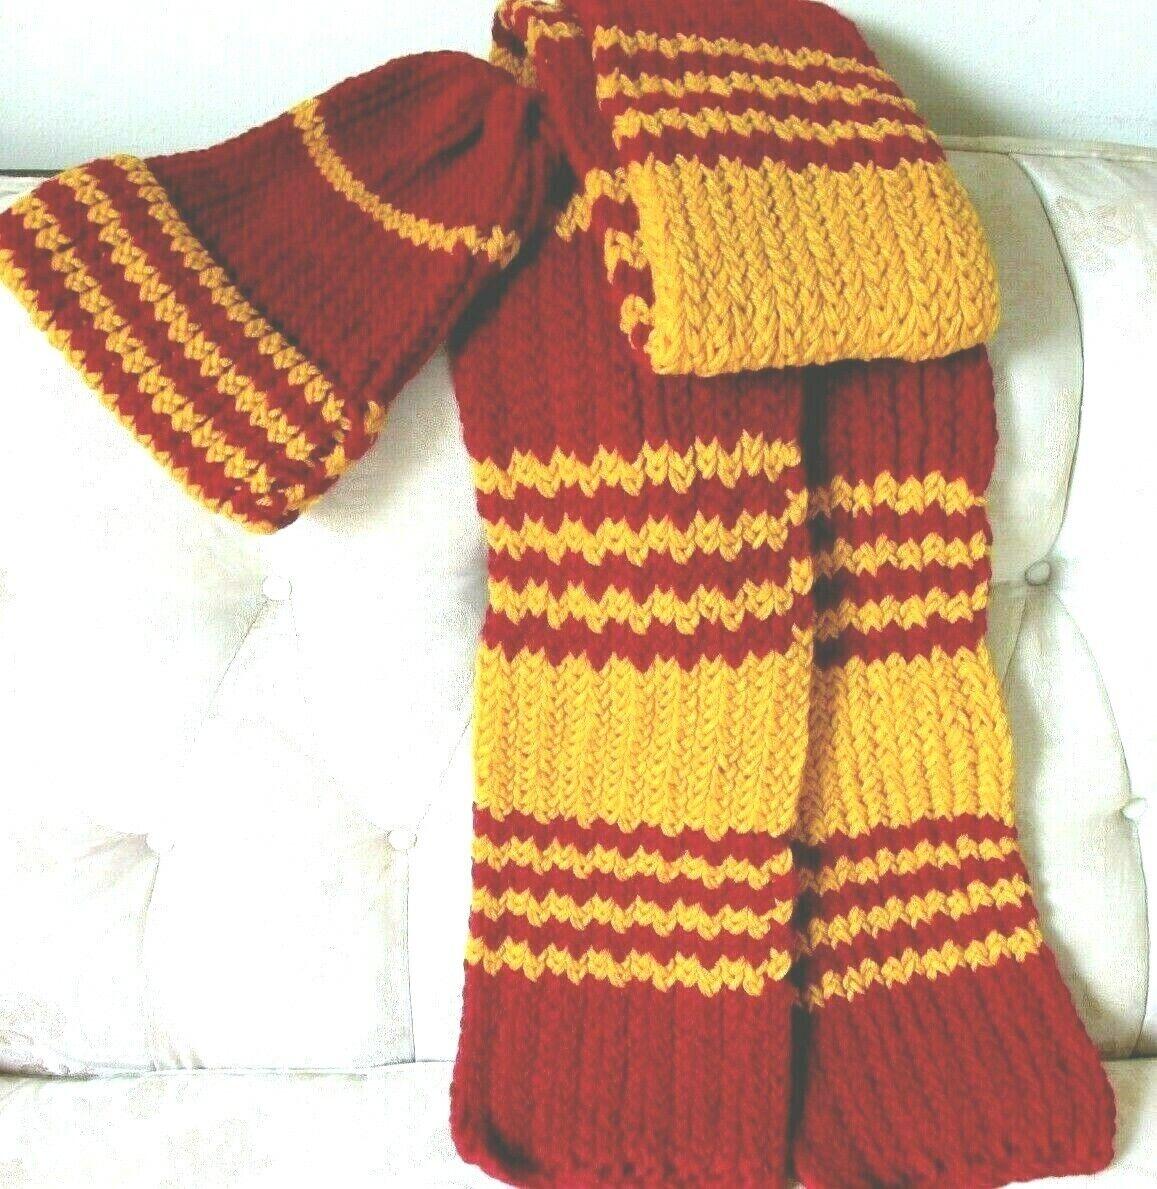 Adult Handmade Unisex Yarn Scarf And Hat 86 Long 7 Width - $24.99